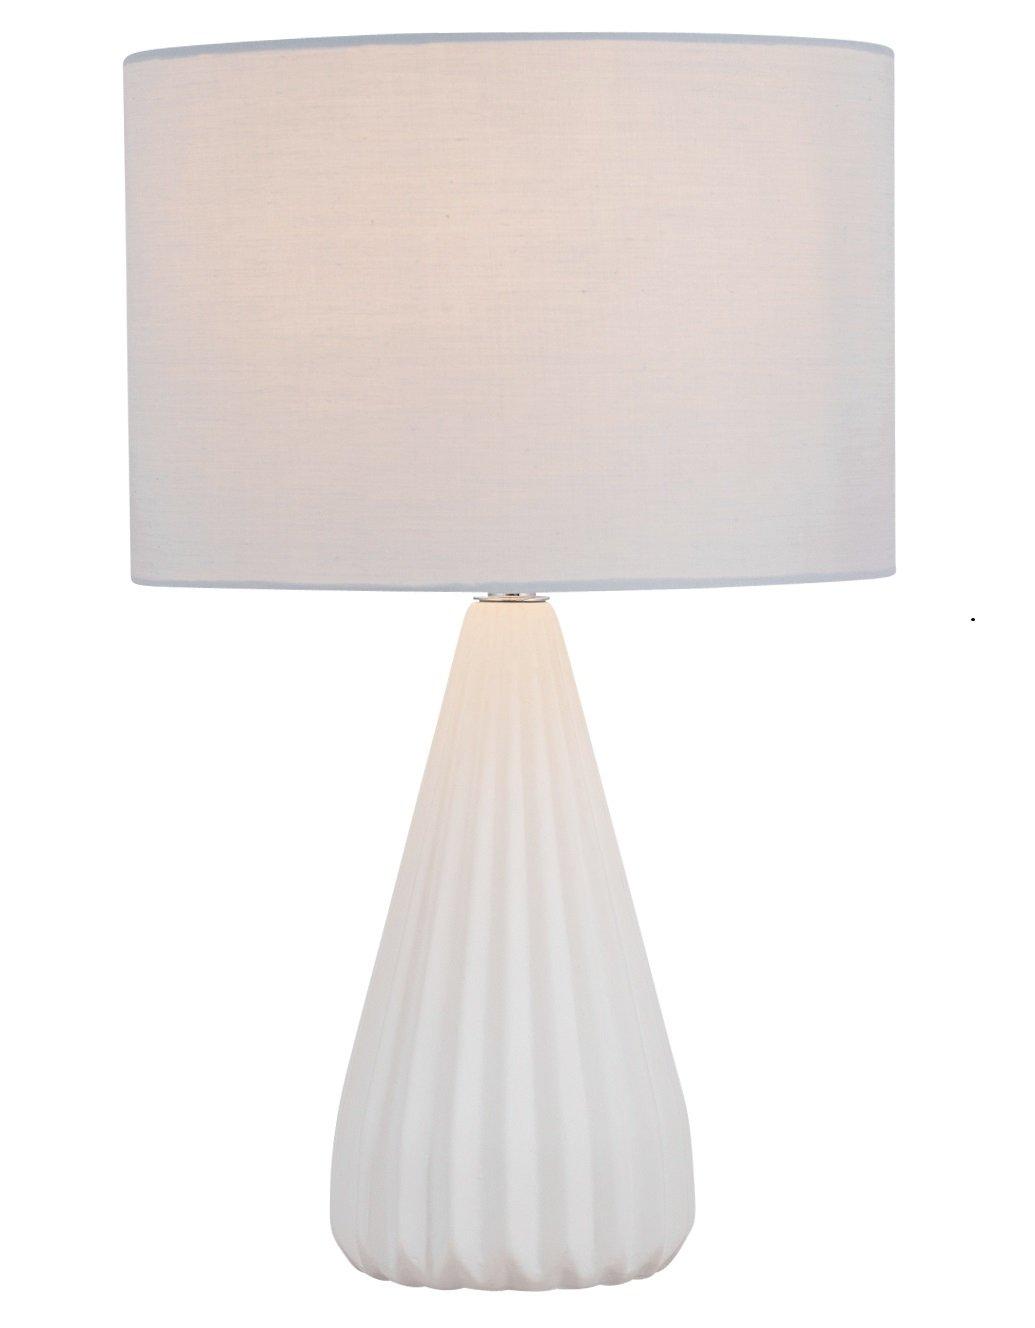 Light Grey Bedside Table: Modern Designer 40cm Ribbed White Ceramic Table Lamp